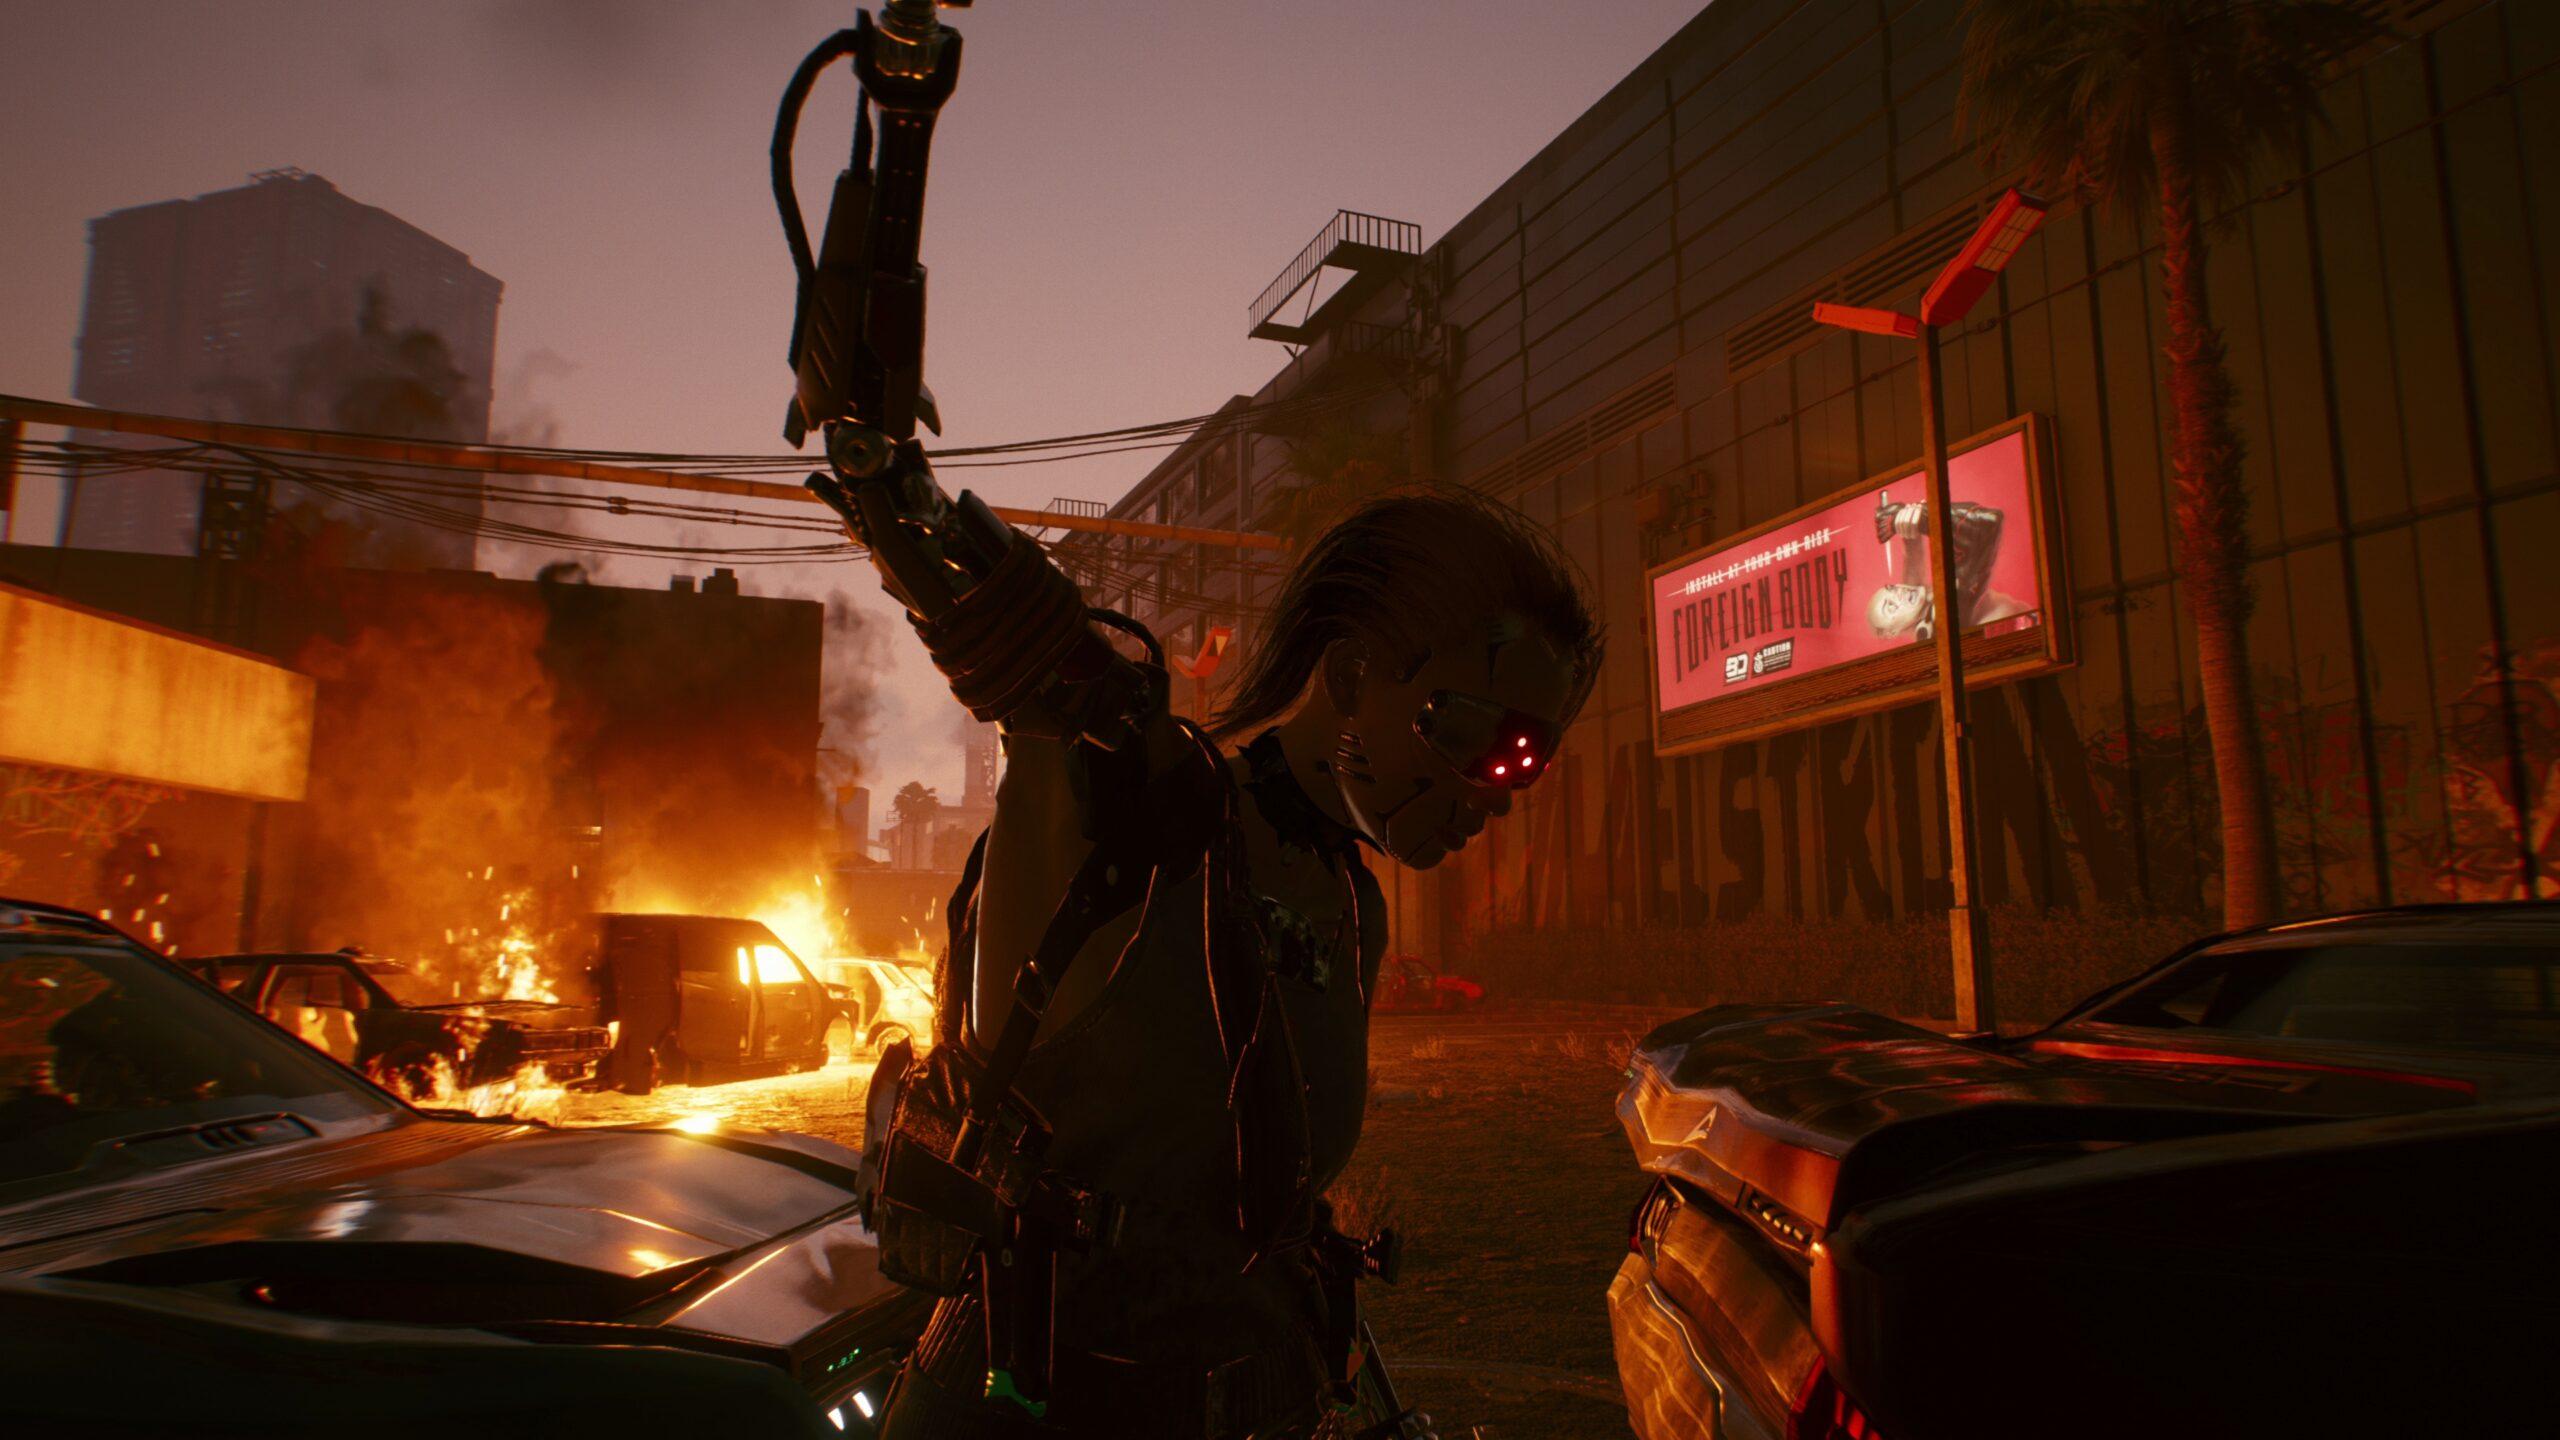 После патча 1.2 онлайн в Cyberpunk 2077 в Steam вырос на треть, но всё равно отстаёт от The Witcher 3: Wild Hunt